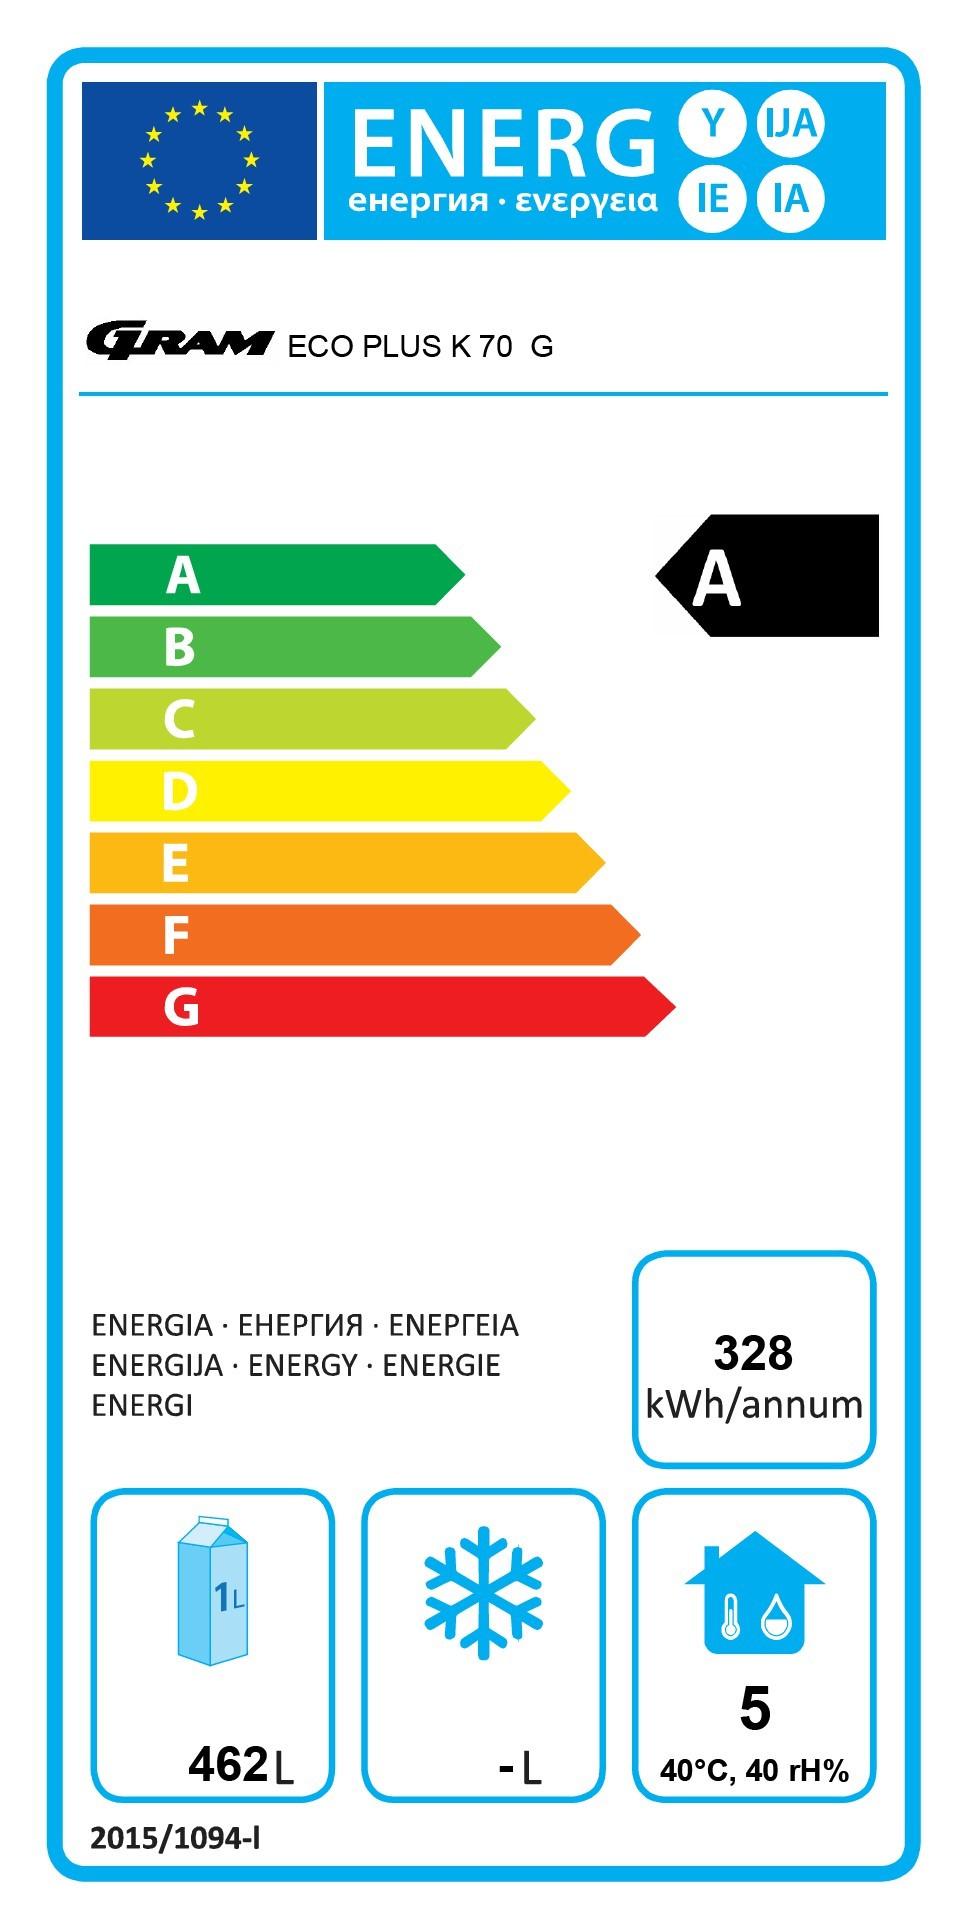 ECO PLUS K 70 CCG C1 4N 610 Ltr Single Door Upright Fridge Energy Rating